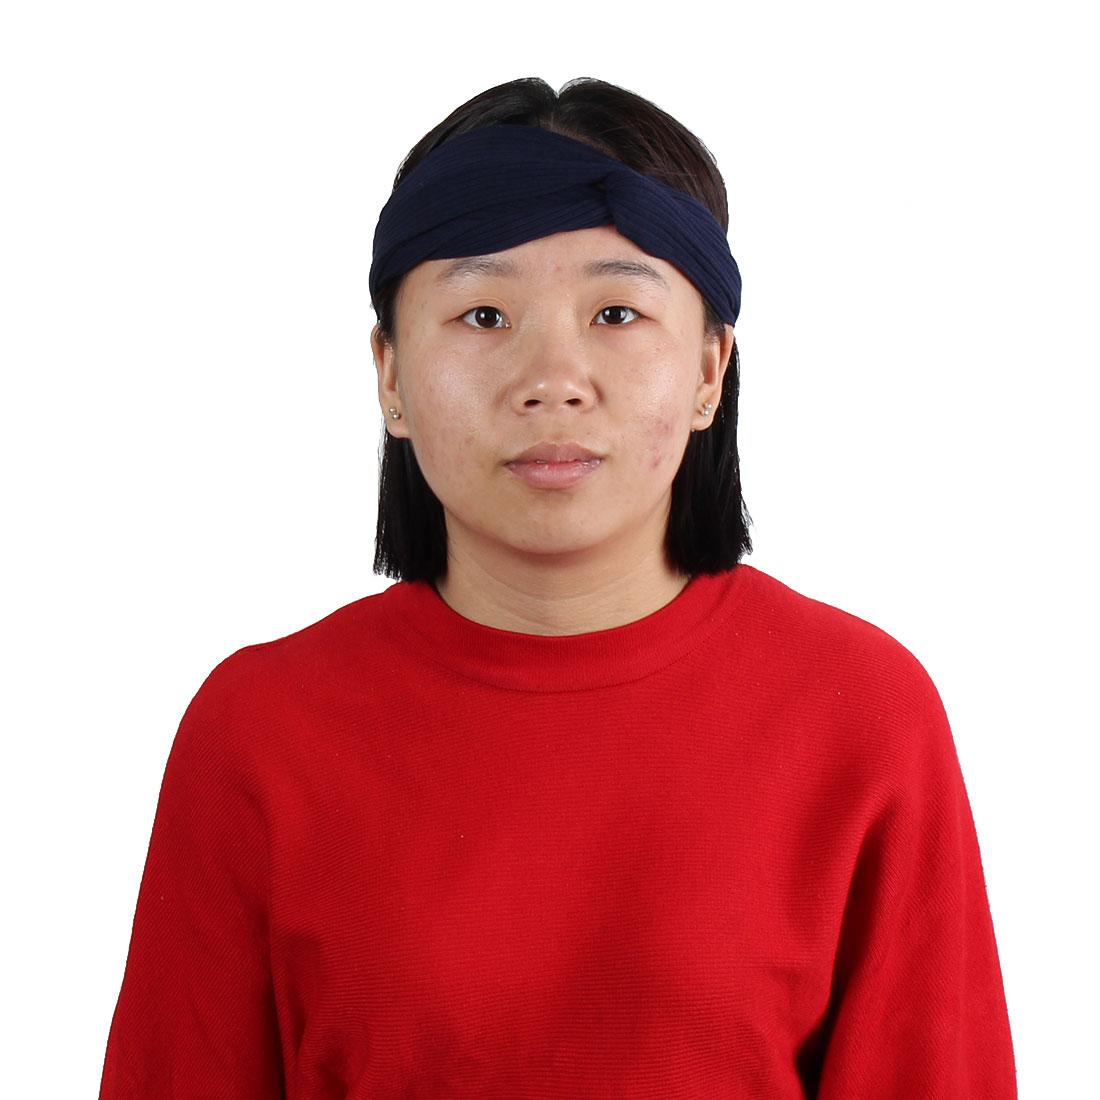 Running Yoga Sports Fabric Elastic Twist Knotted Hairband Headband